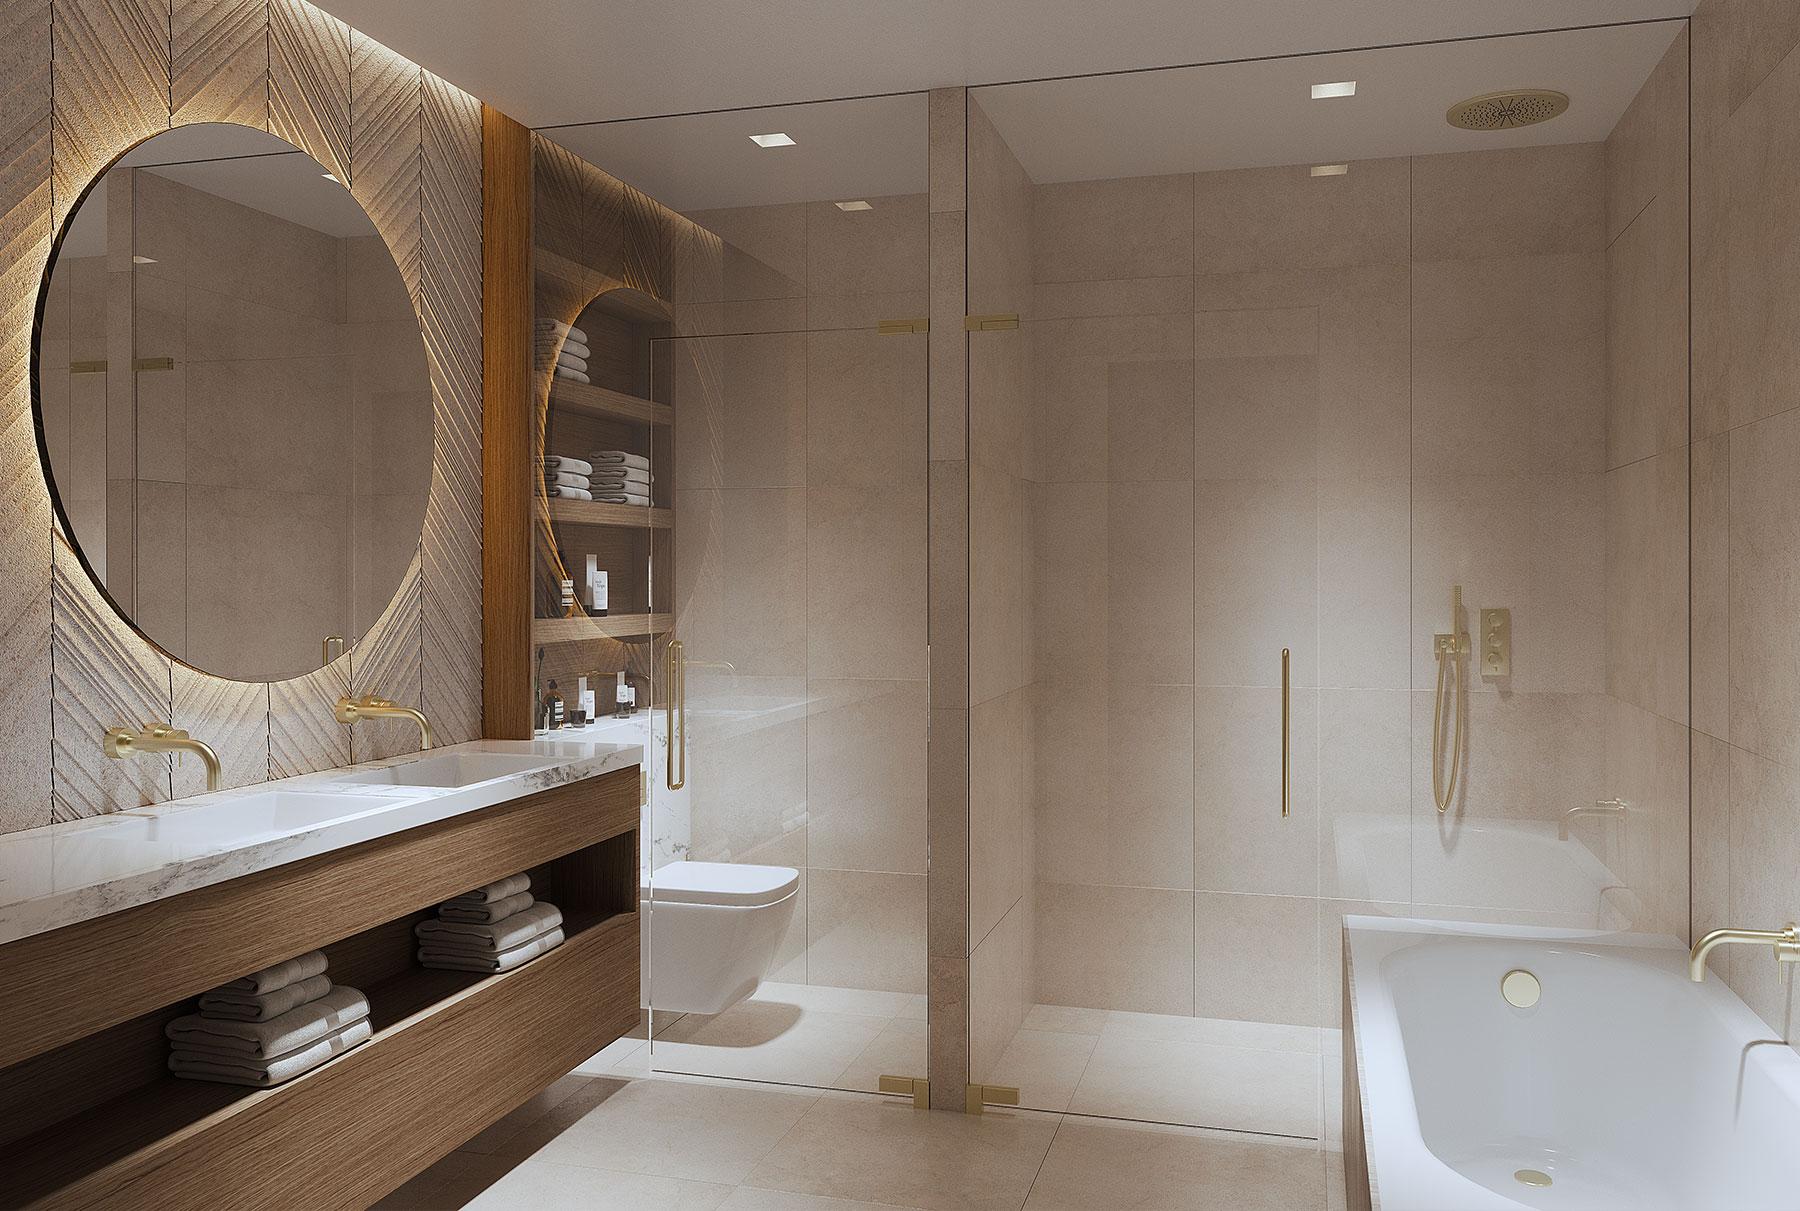 Impeccable Porcelain Bathroom Fittings